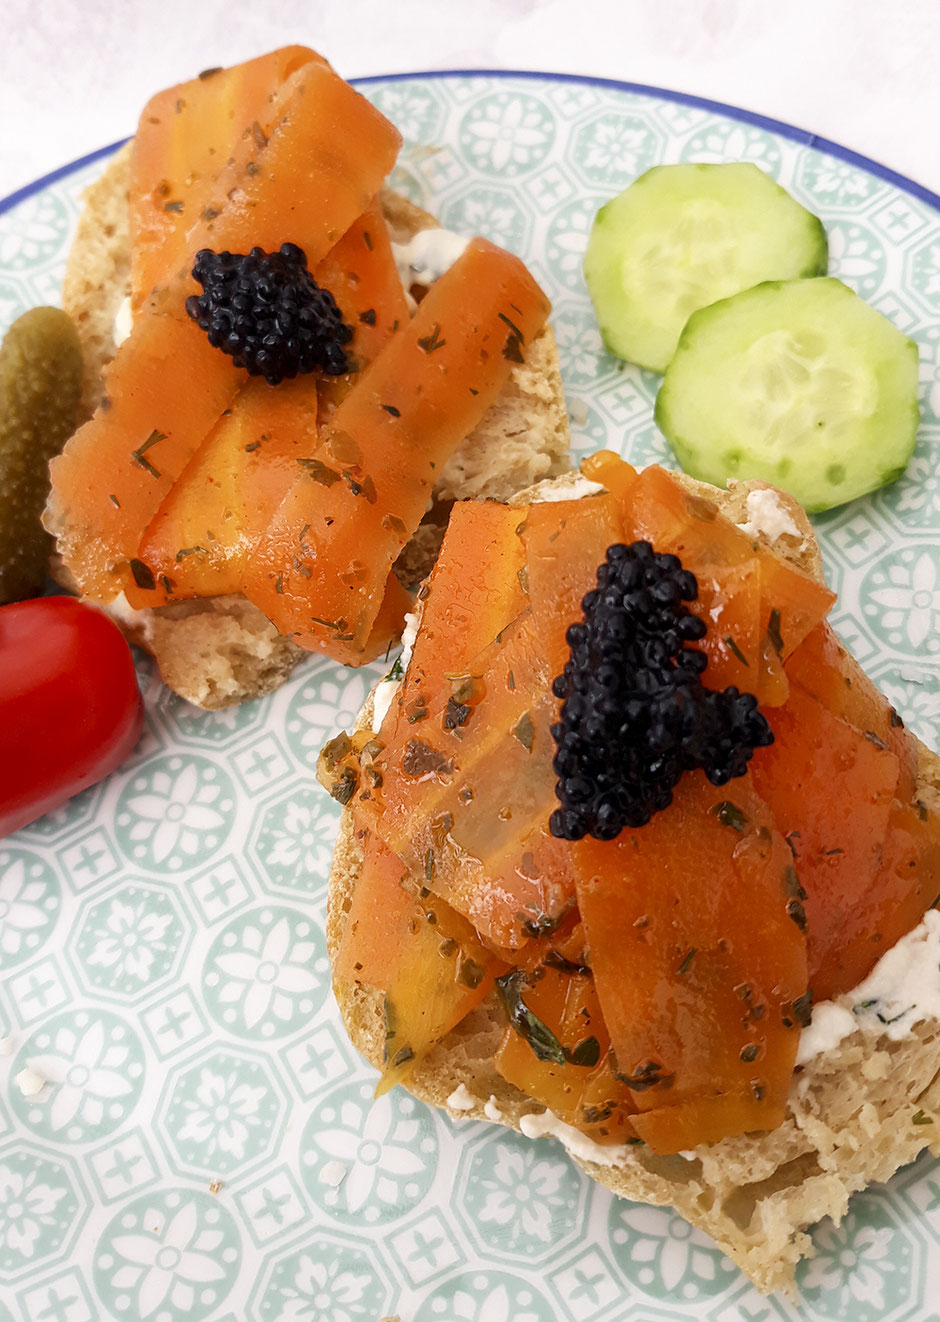 Veganer Lachs, Karottenlachs vegan